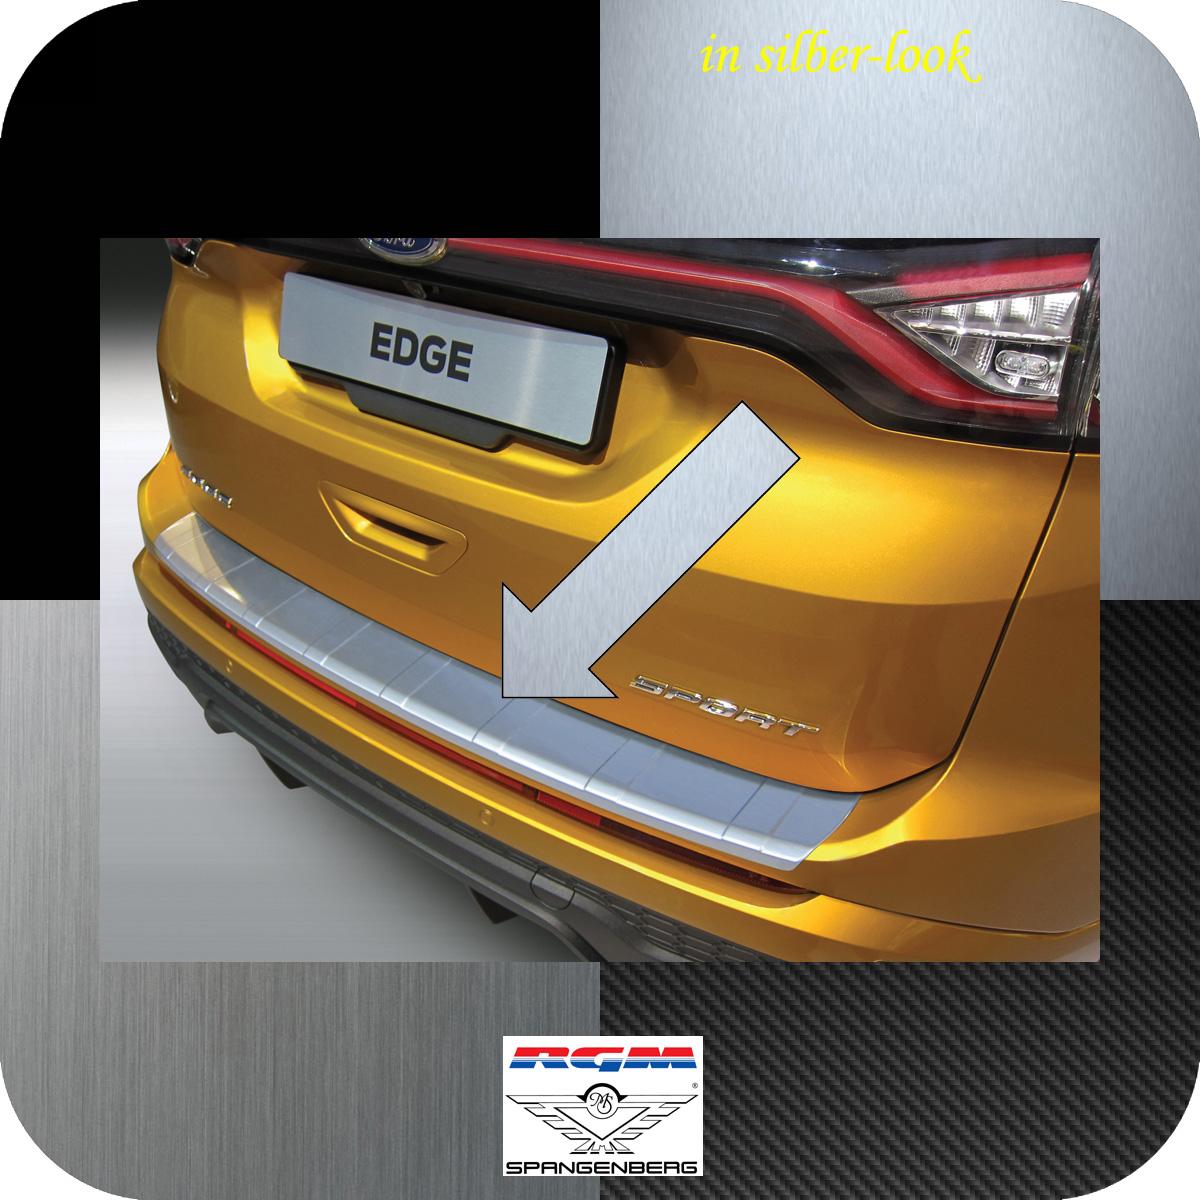 Ladekantenschutz Silber-Look gerippt Ford Edge II vor facelift 2016-18 3506965